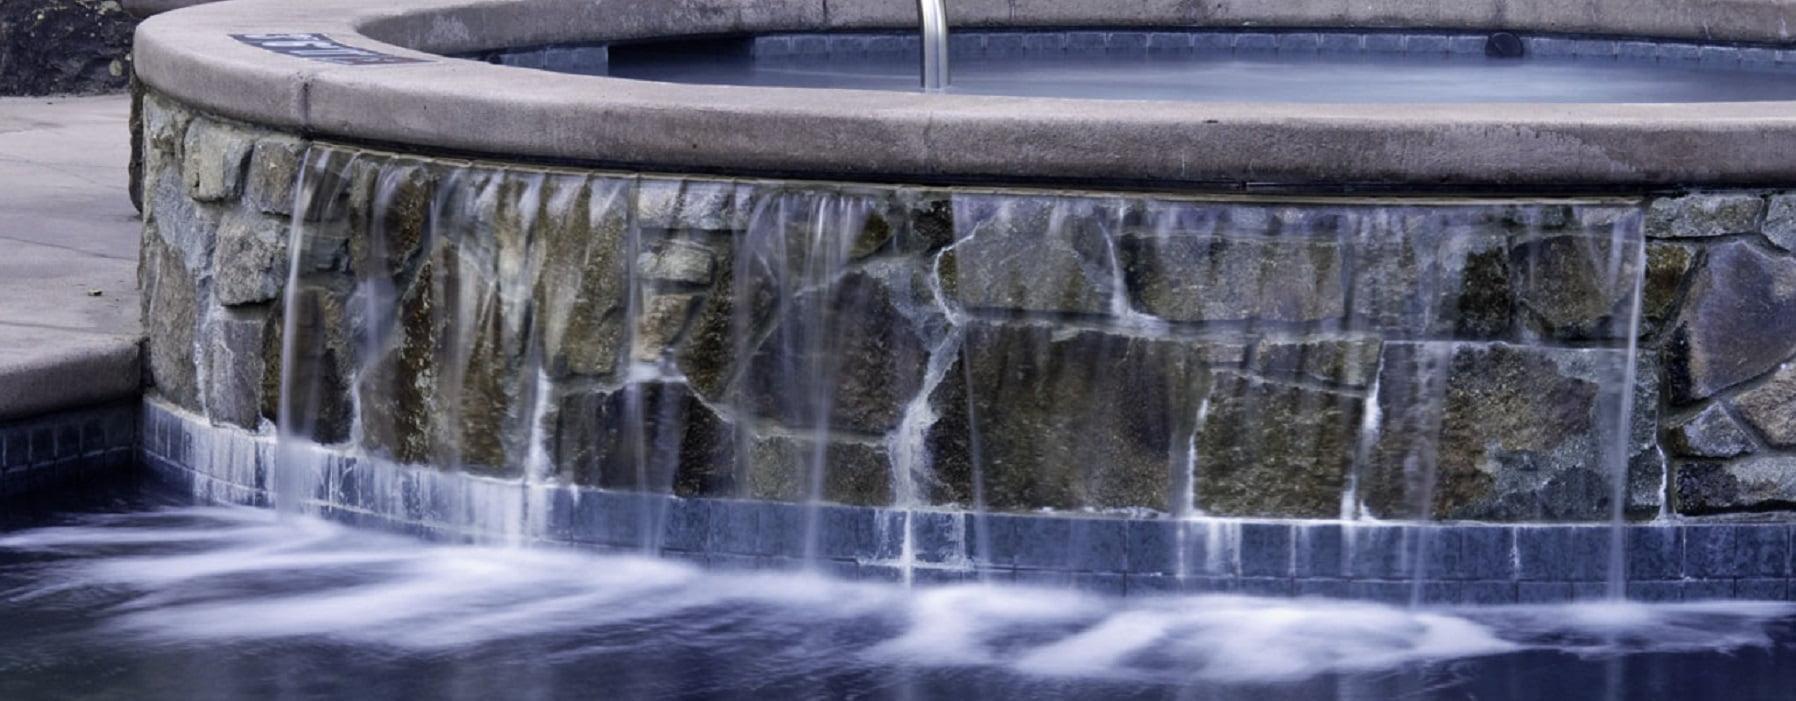 lodge fountain